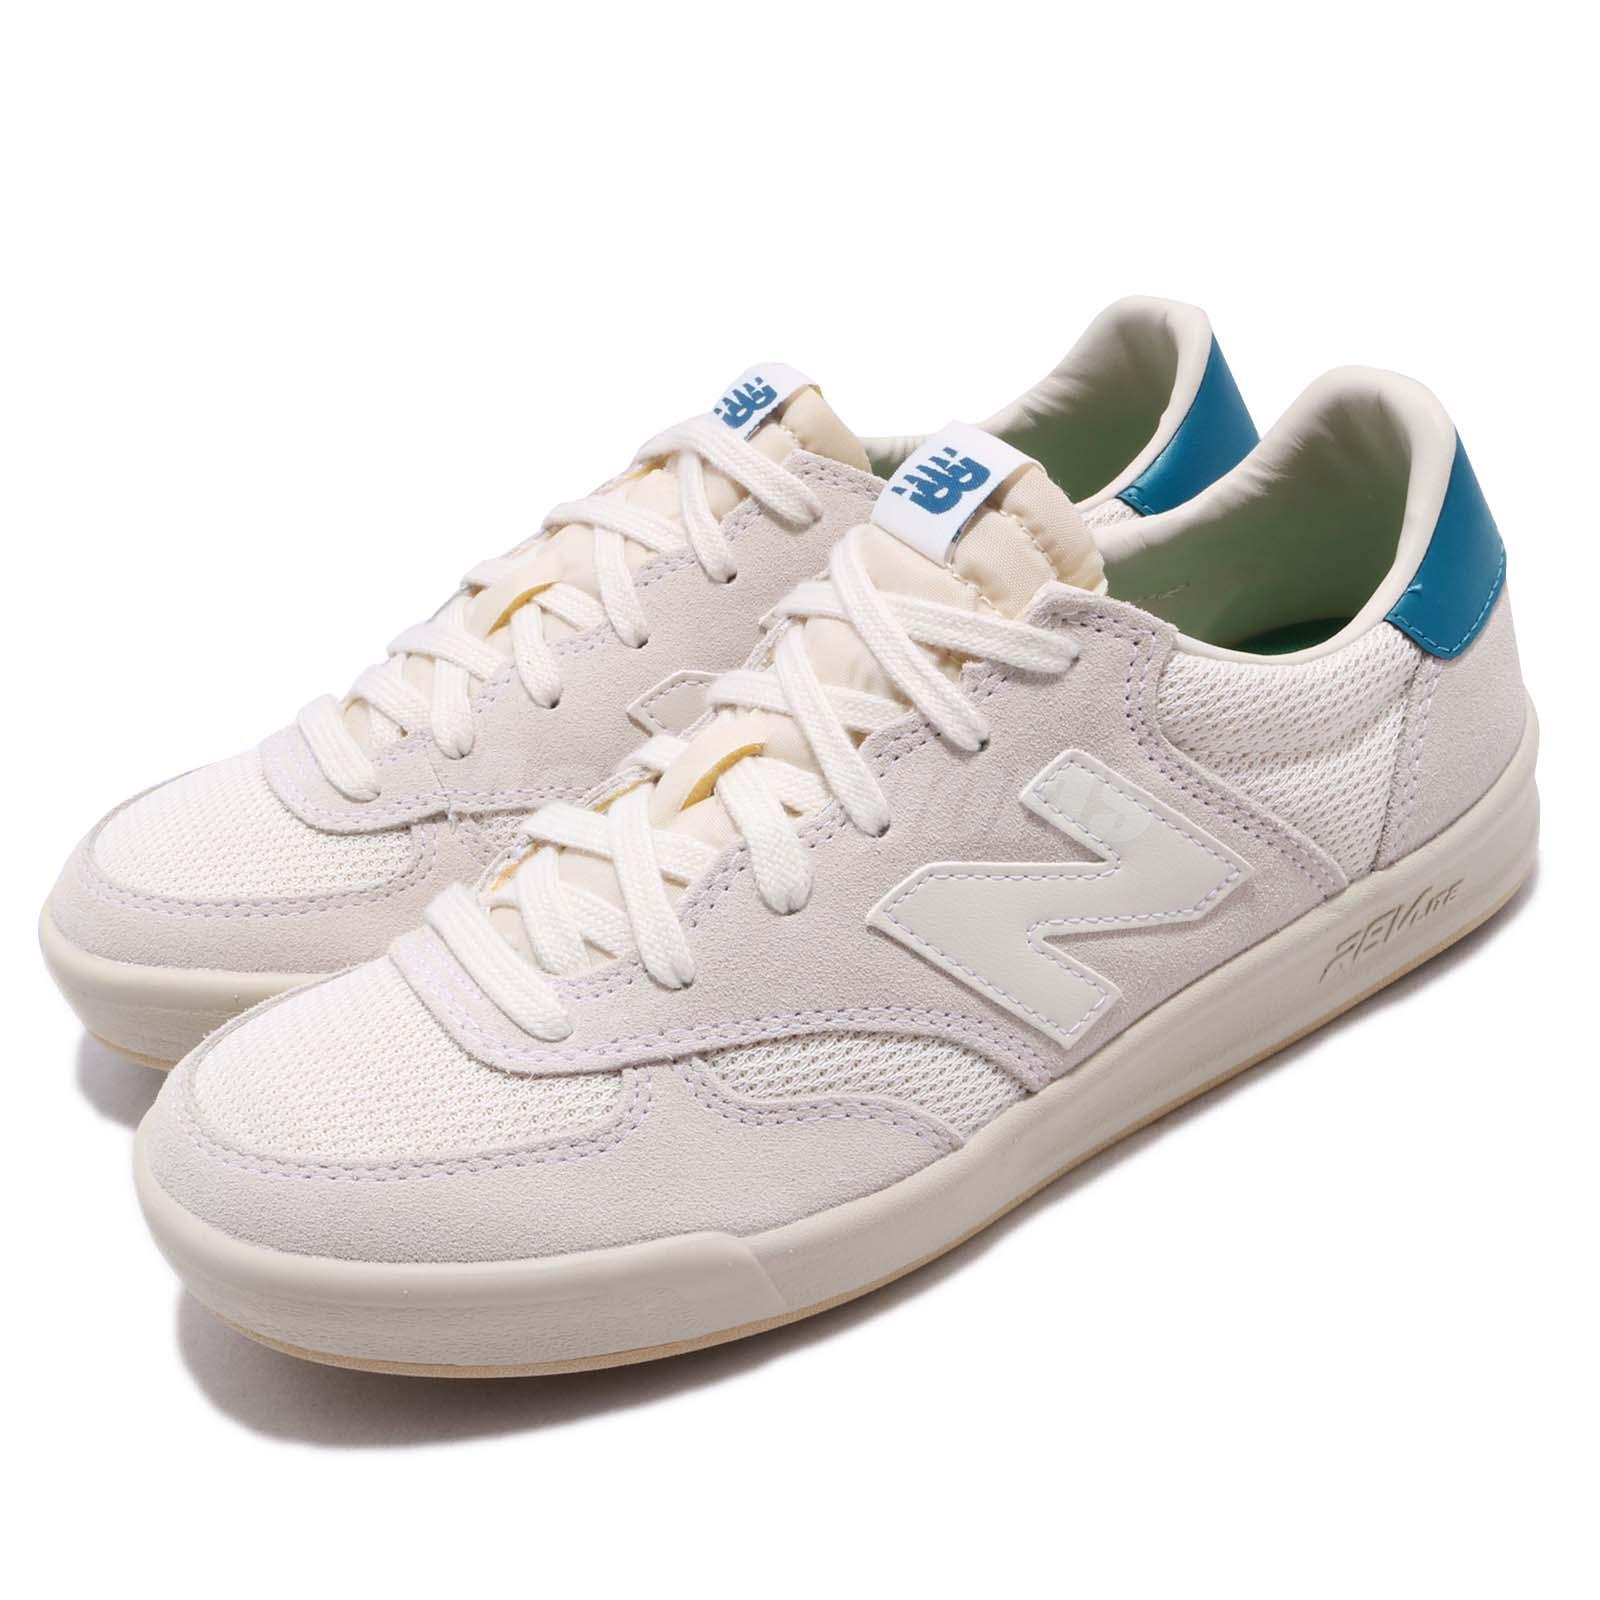 New Balance CRT300VW D Beige Blue Suede Men Casual Shoes Sneakers CRT300VWD